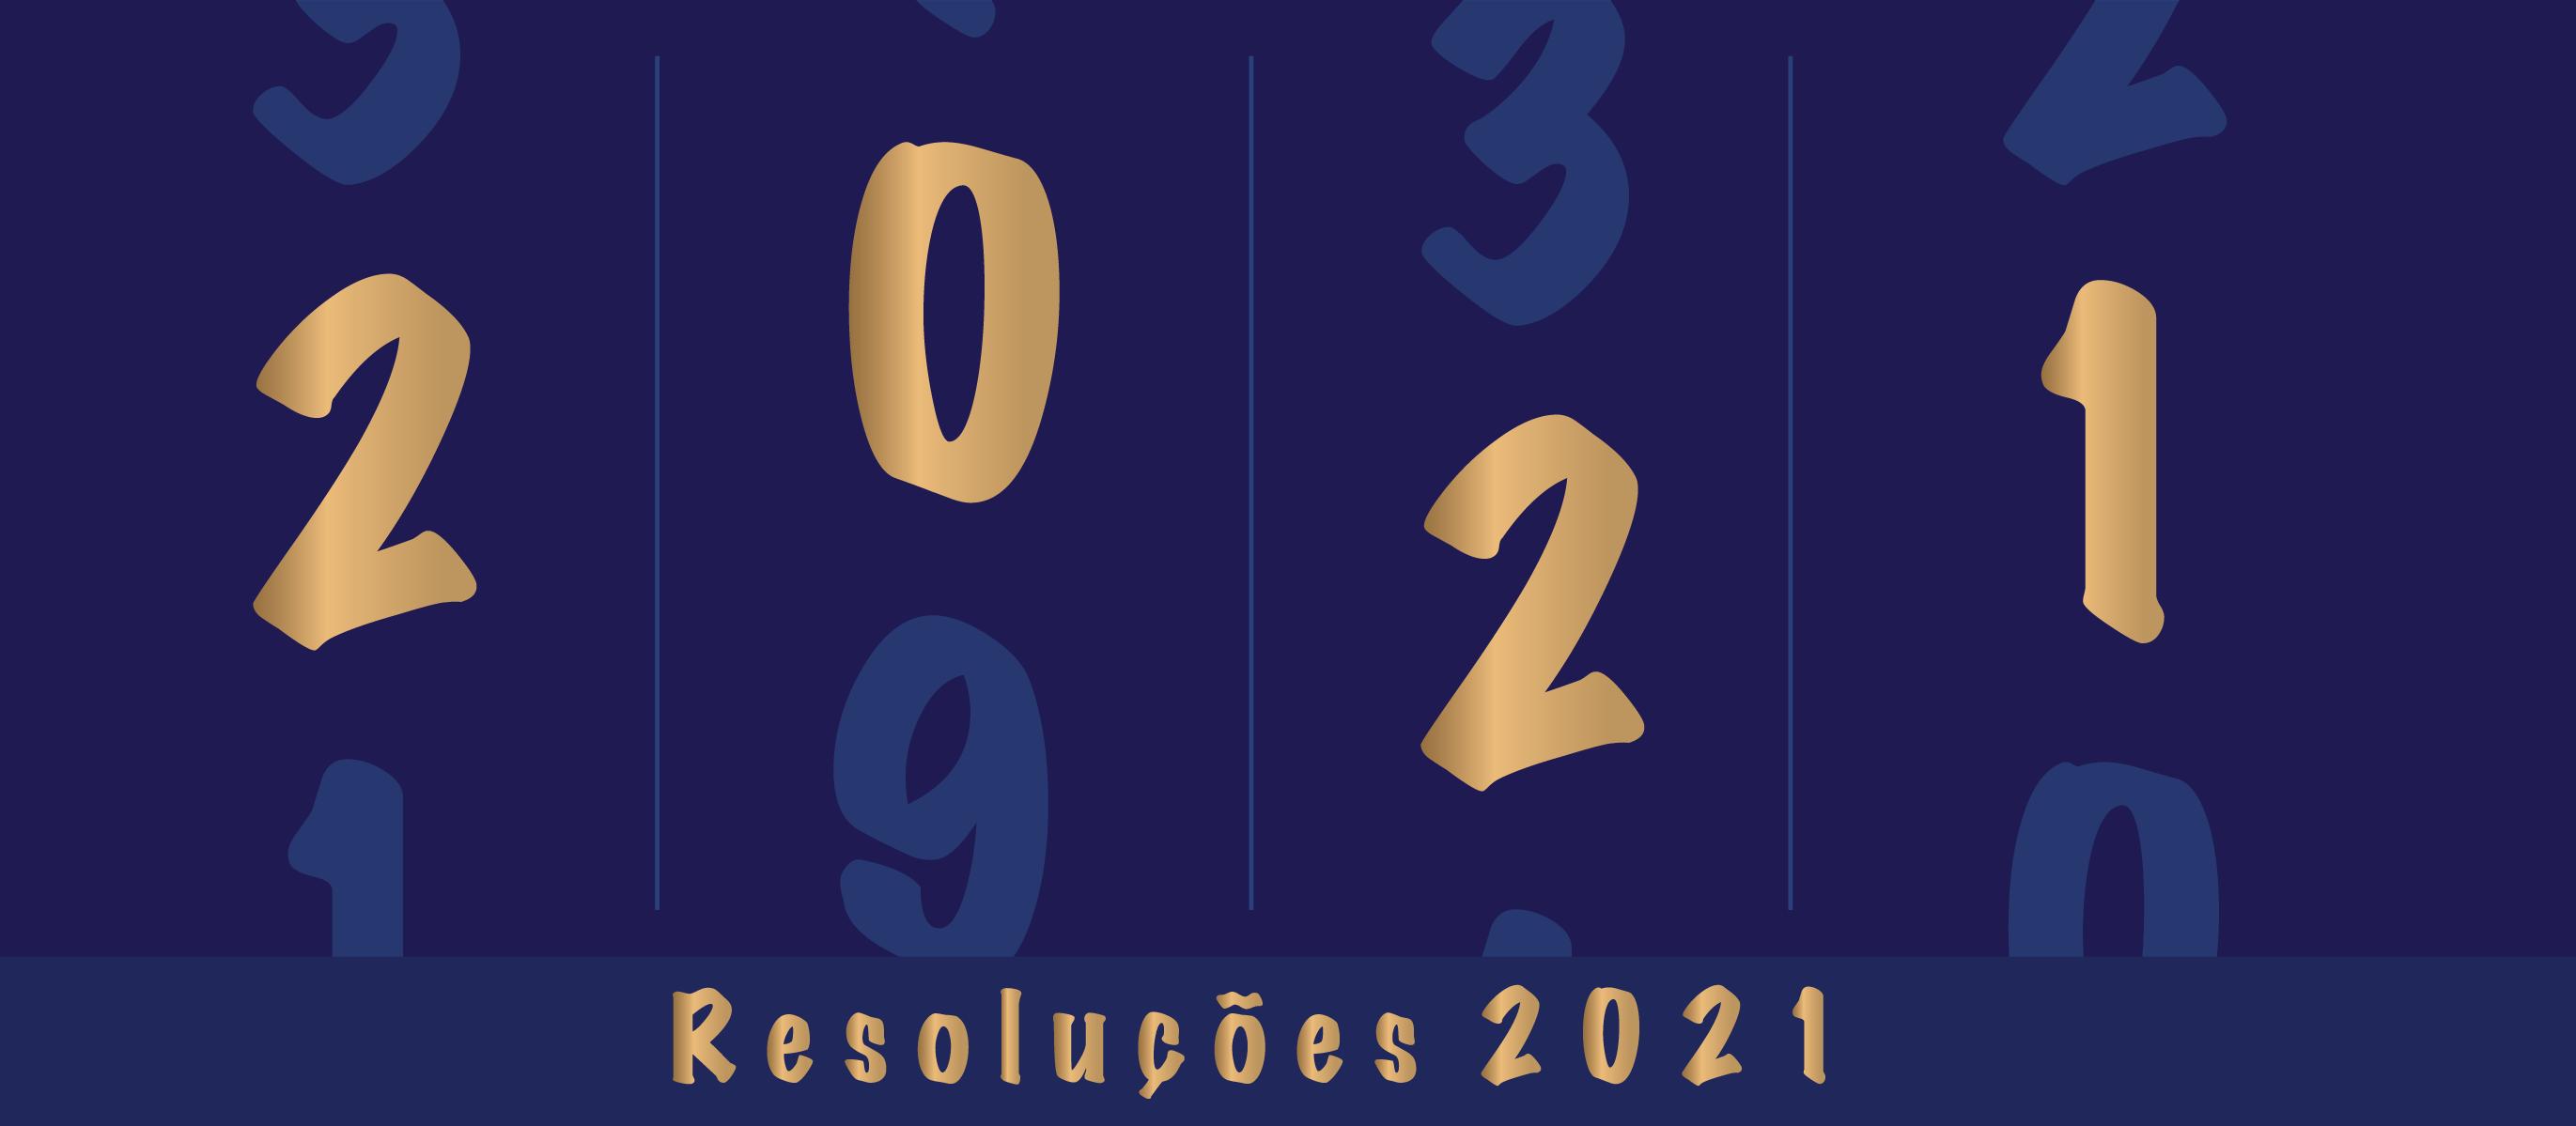 7 resoluciones para vivir mejor en el 2021   Orkut Buyukkokten